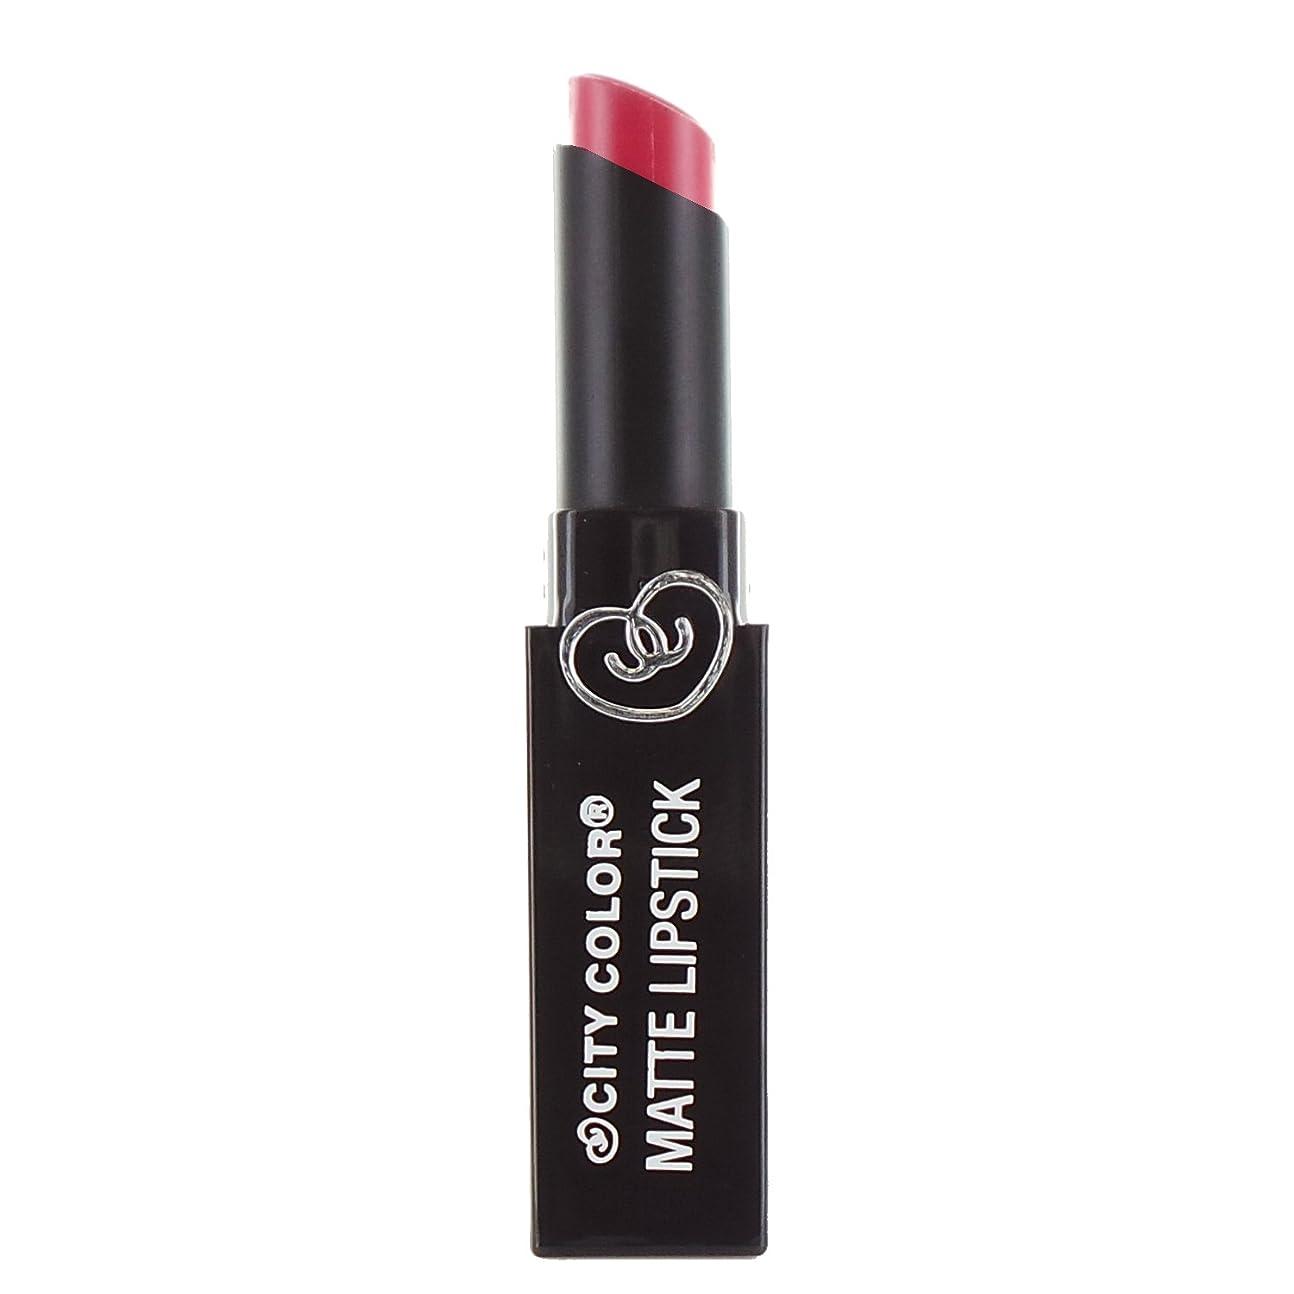 司法胚素人CITY COLOR Matte Lipstick L0050B - Rosy Mauve (並行輸入品)